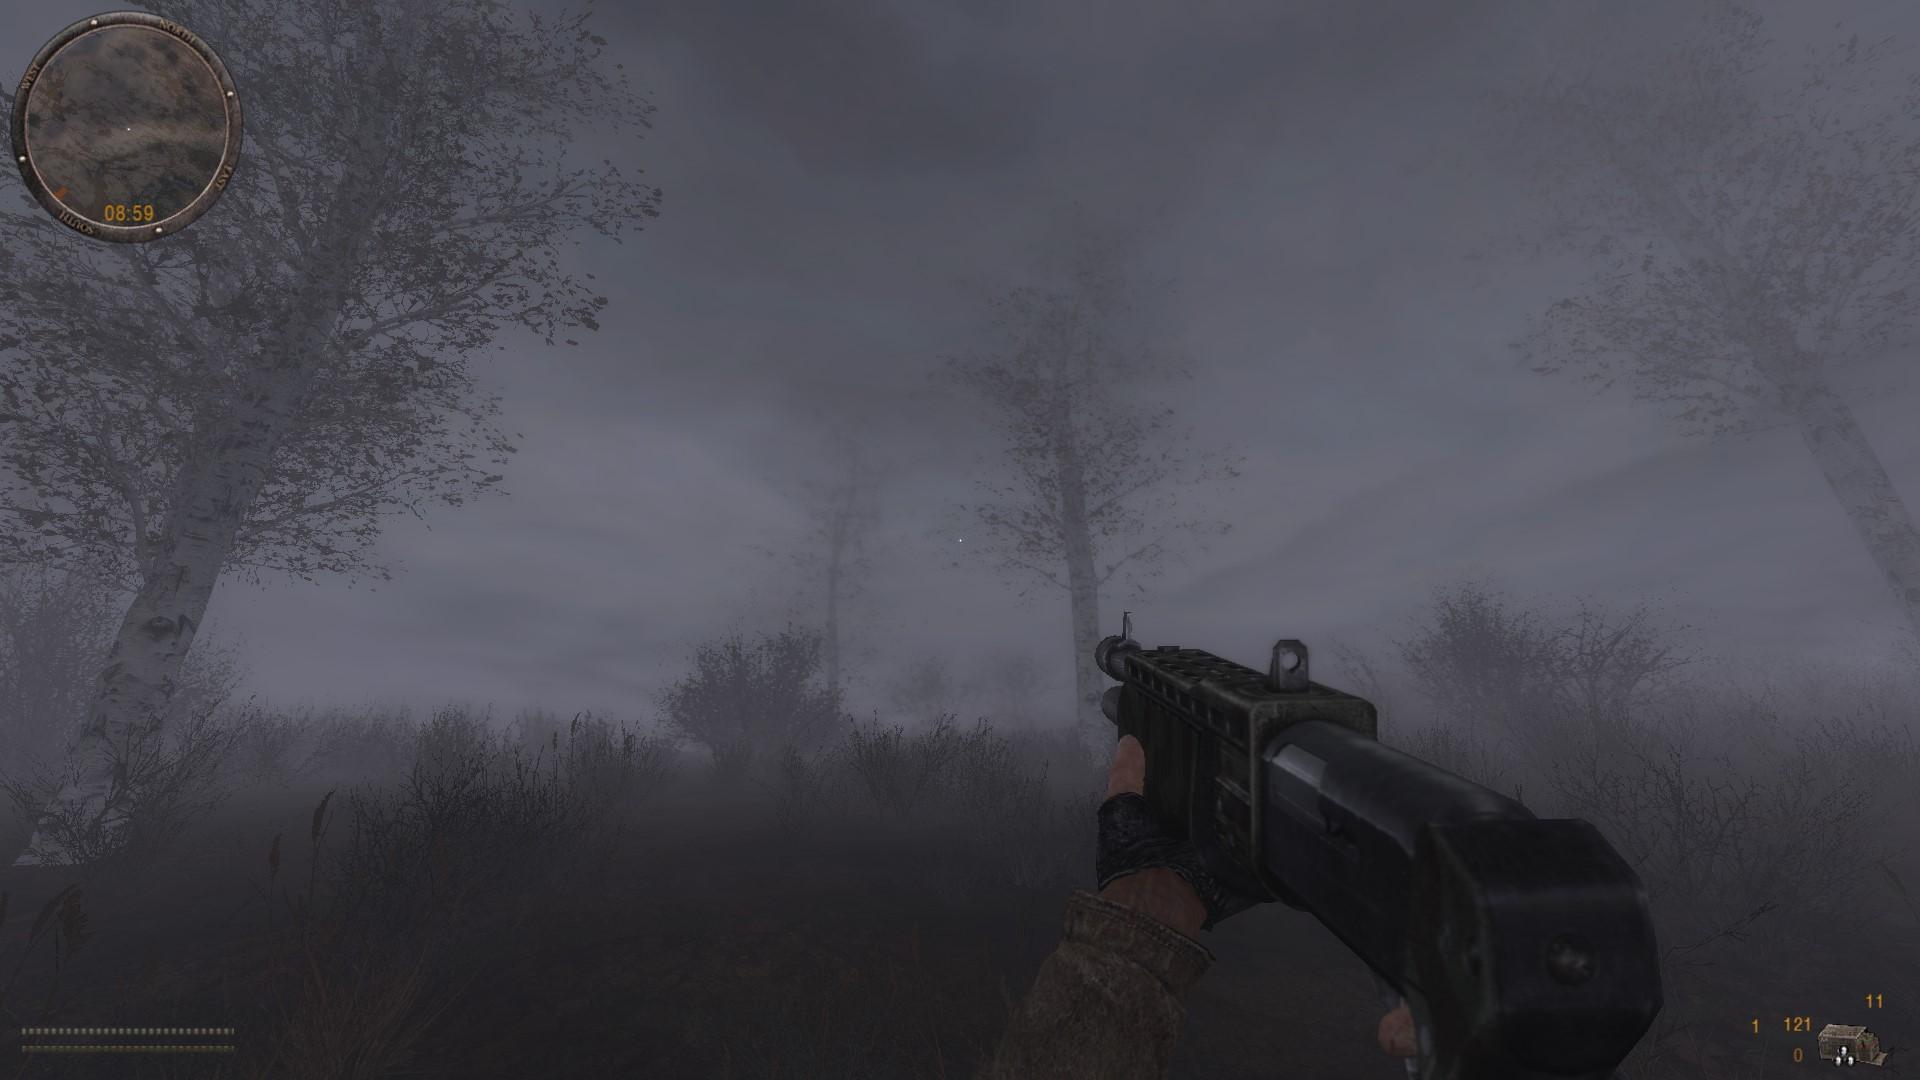 ss_Администратор_05-02-18_21-51-13_(zaton).jpg - S.T.A.L.K.E.R.: Call of Pripyat